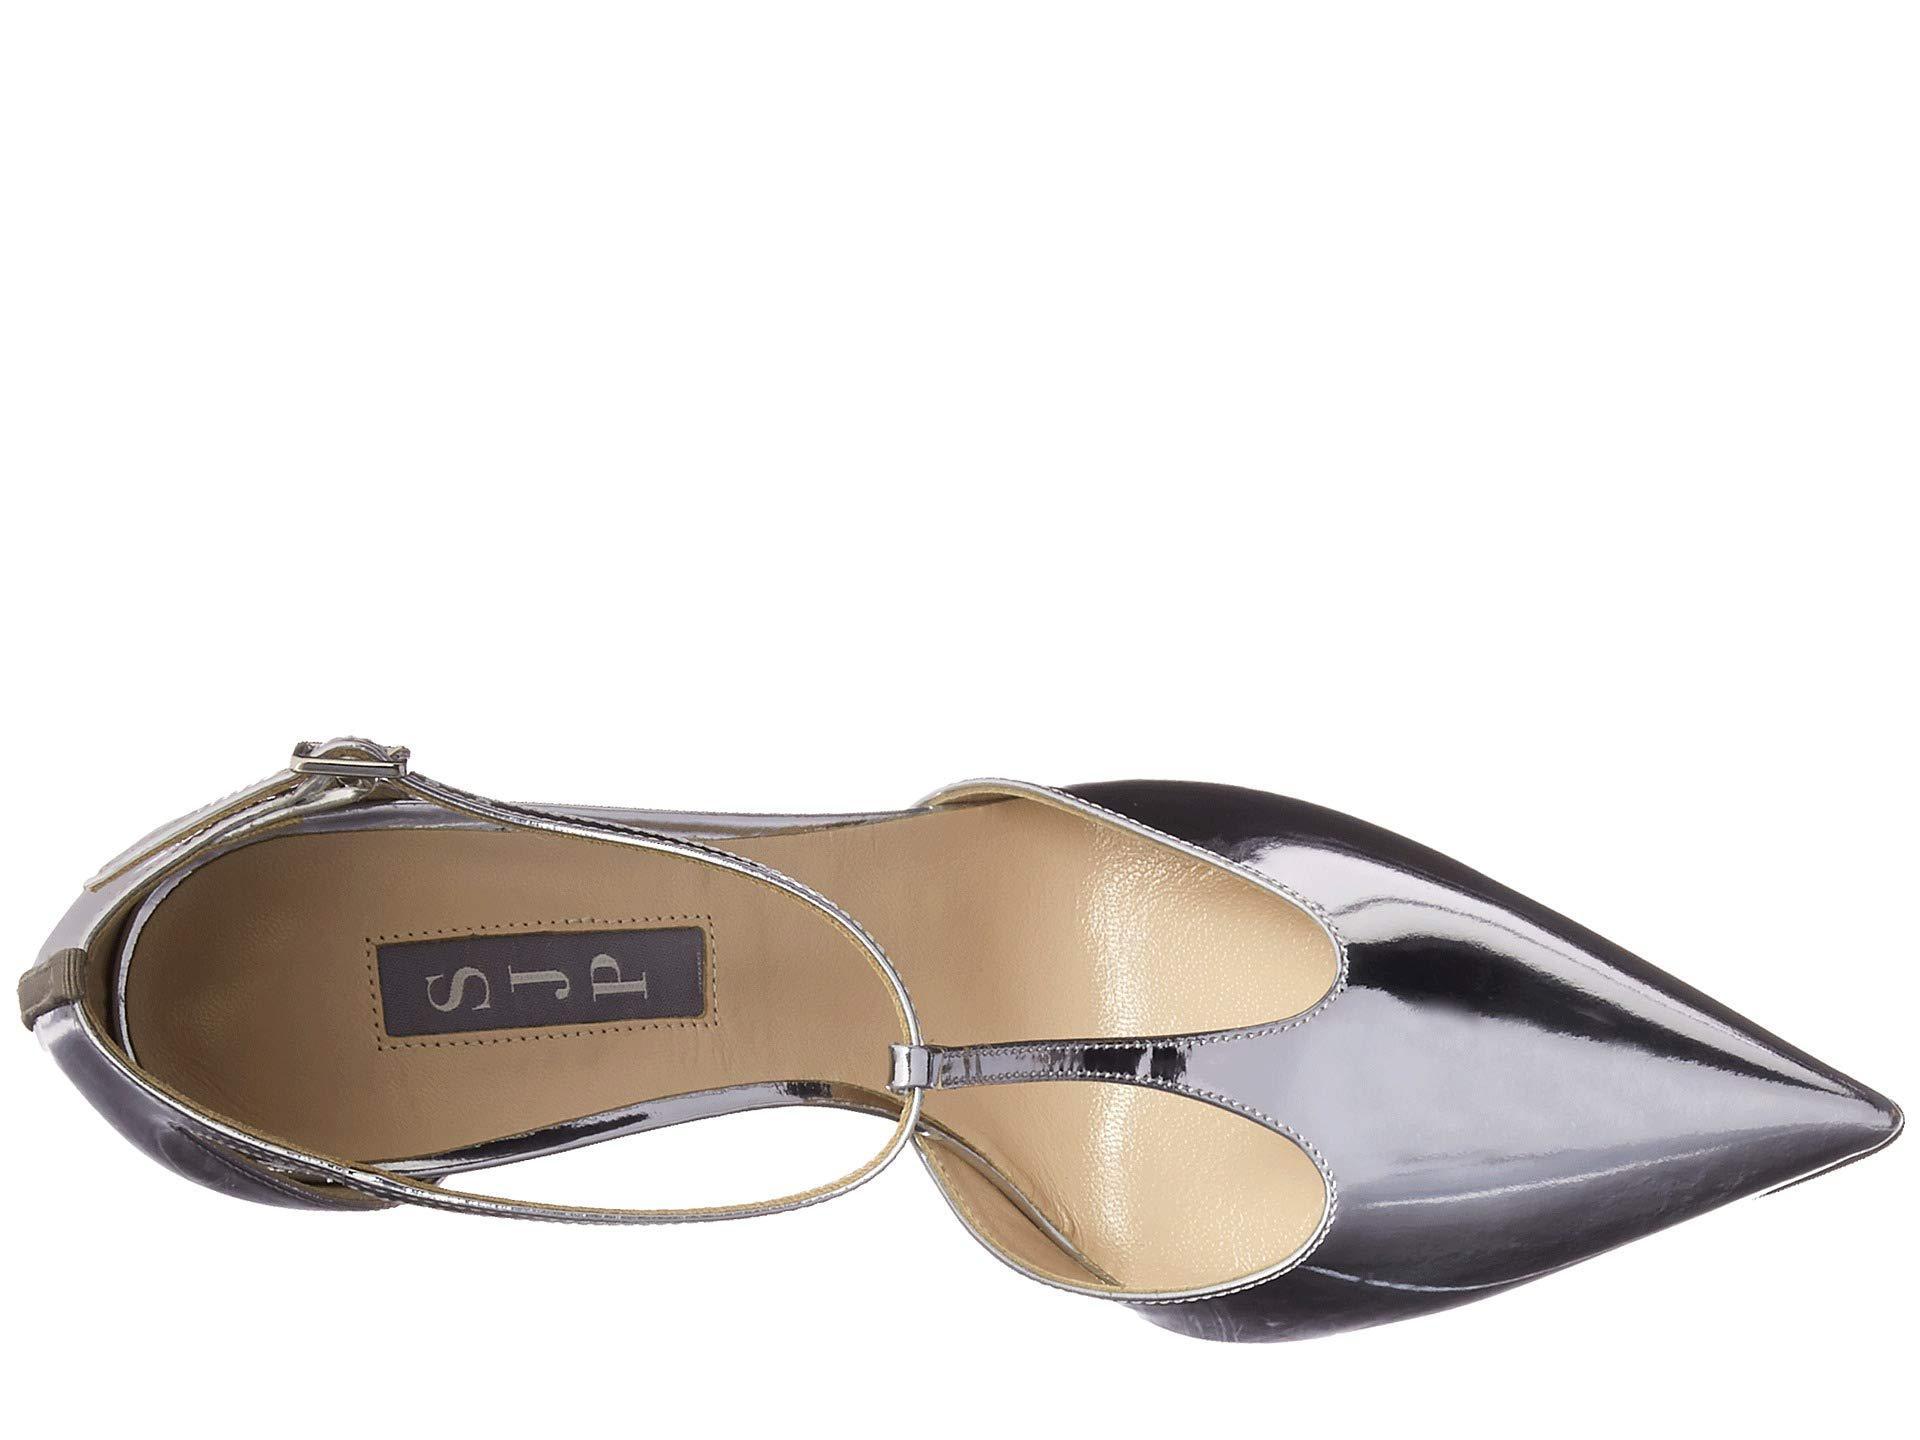 9241854622f SJP by Sarah Jessica Parker - Metallic Taylor (silver Scintillate) Women s  Shoes - Lyst. View fullscreen